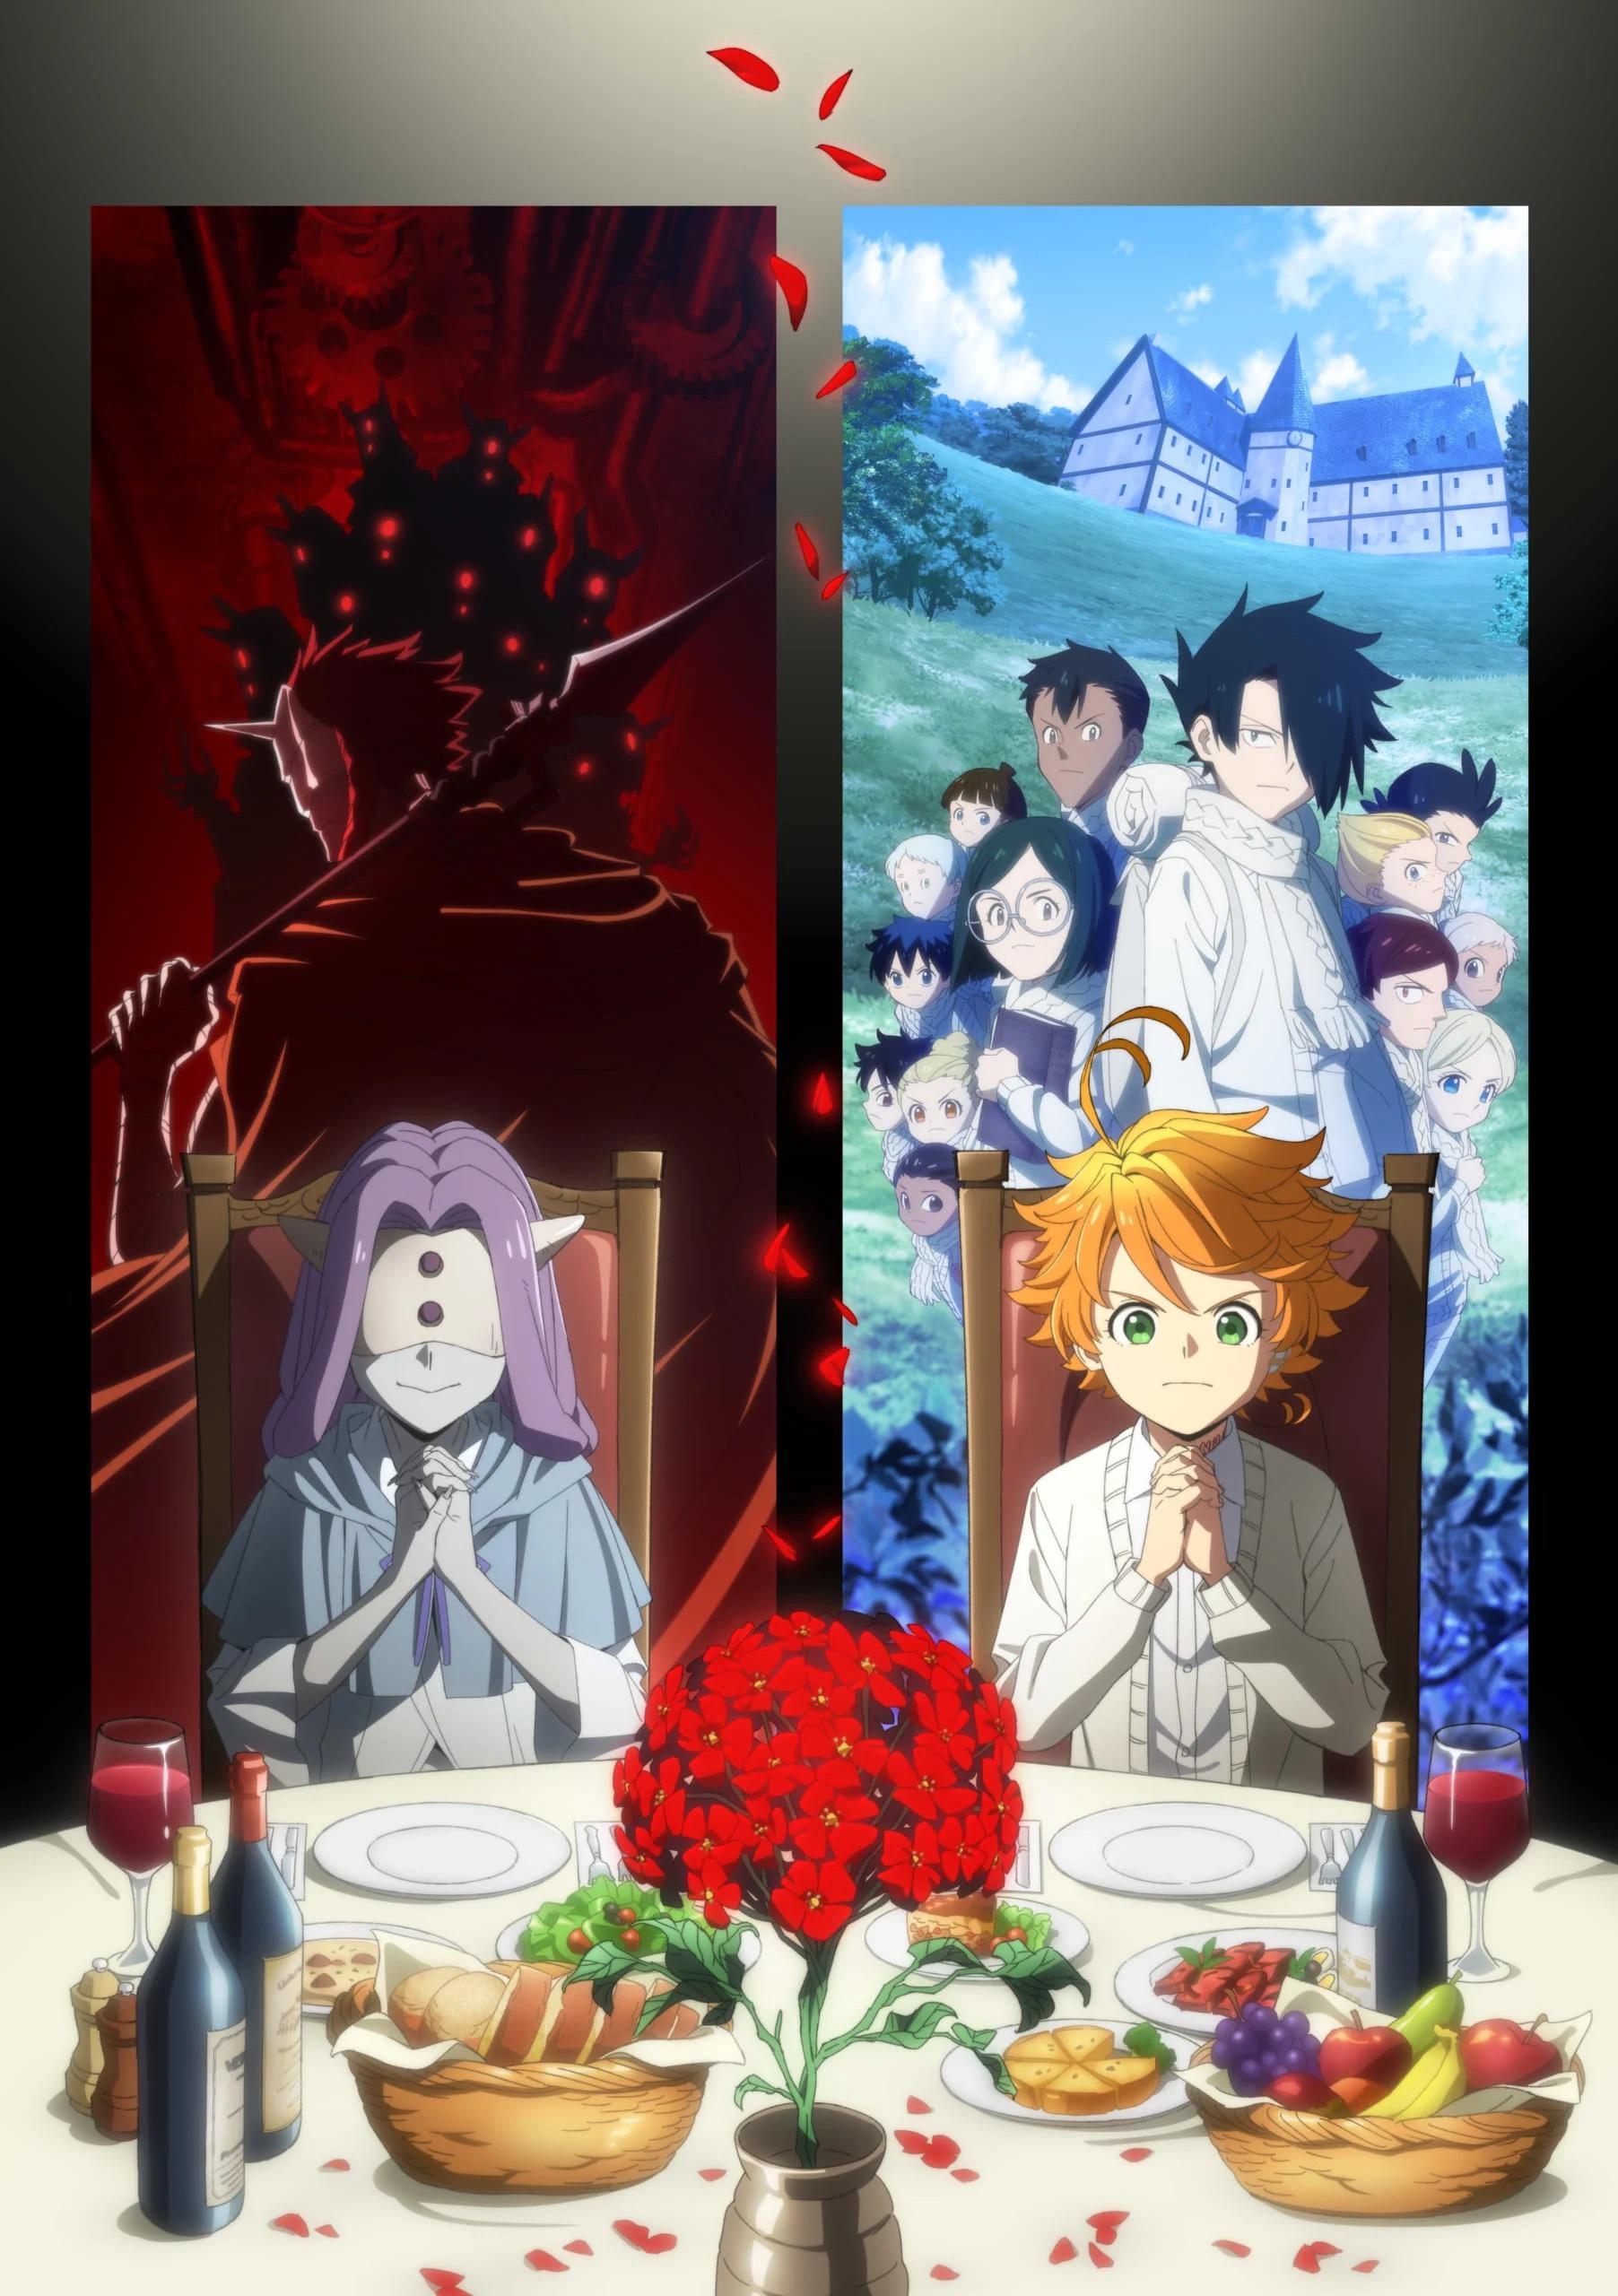 TVアニメ「約束のネバーランド」Season 2 キービジュアル